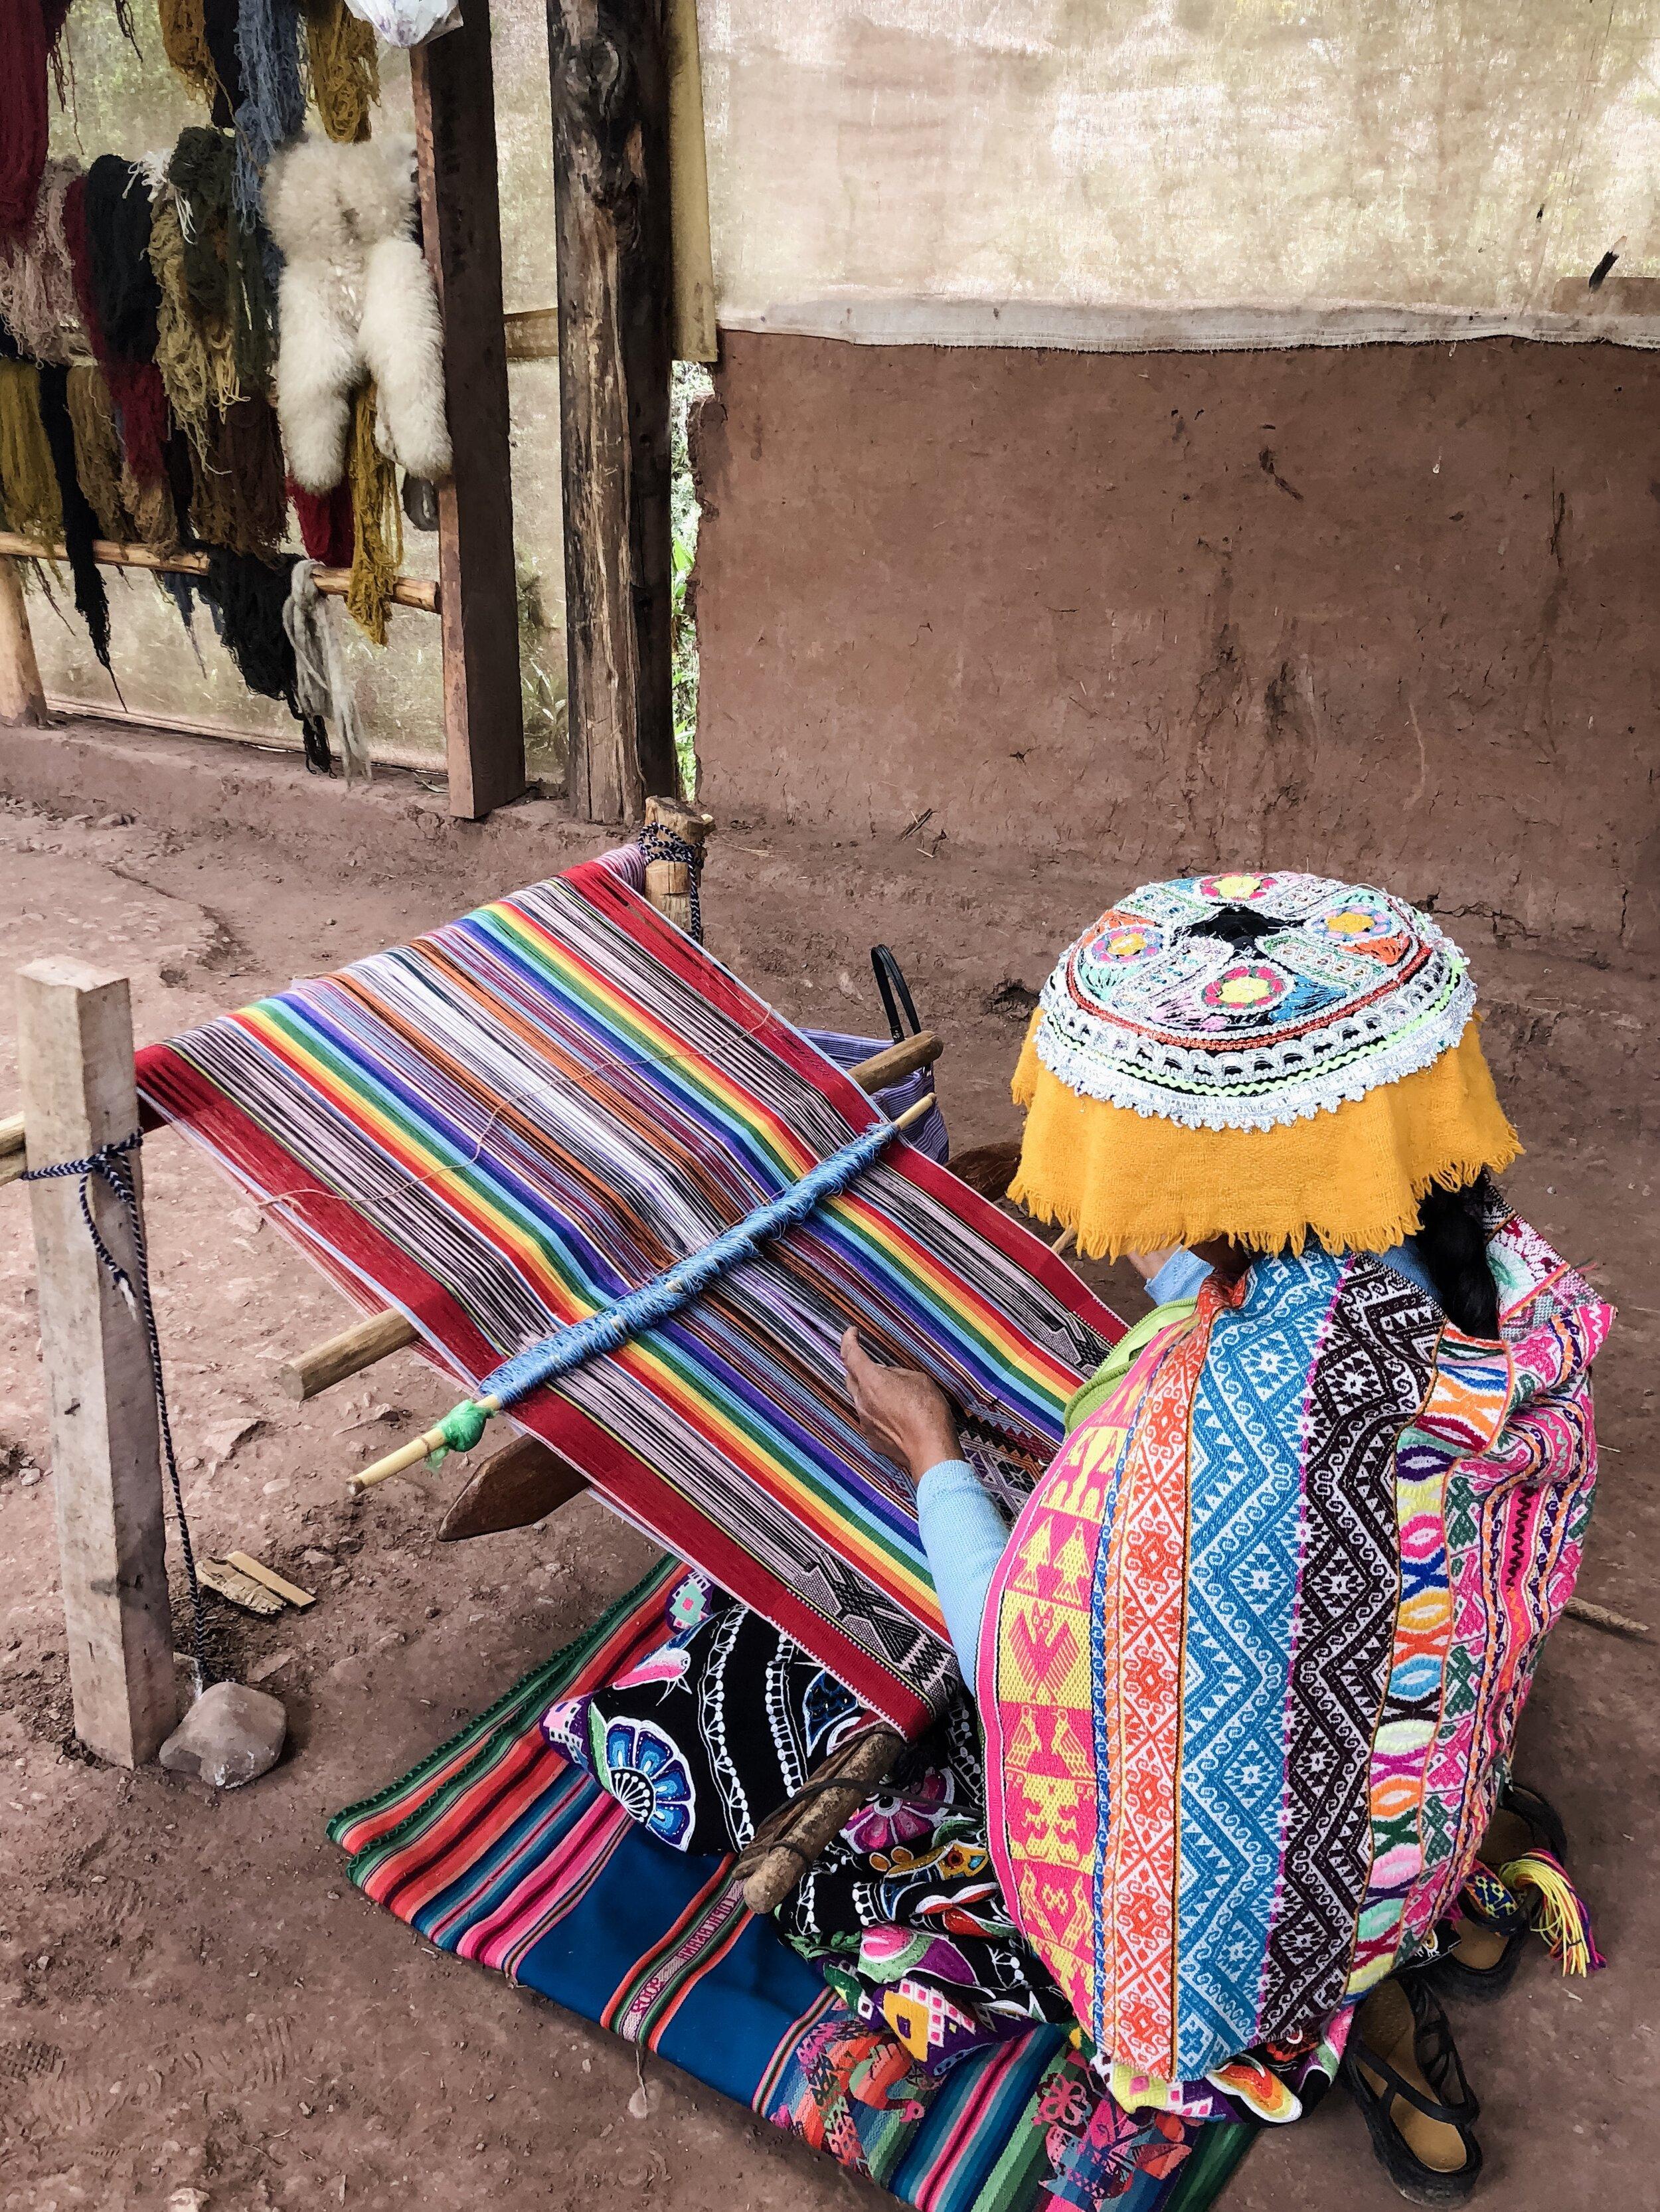 Handwoven Ponchos